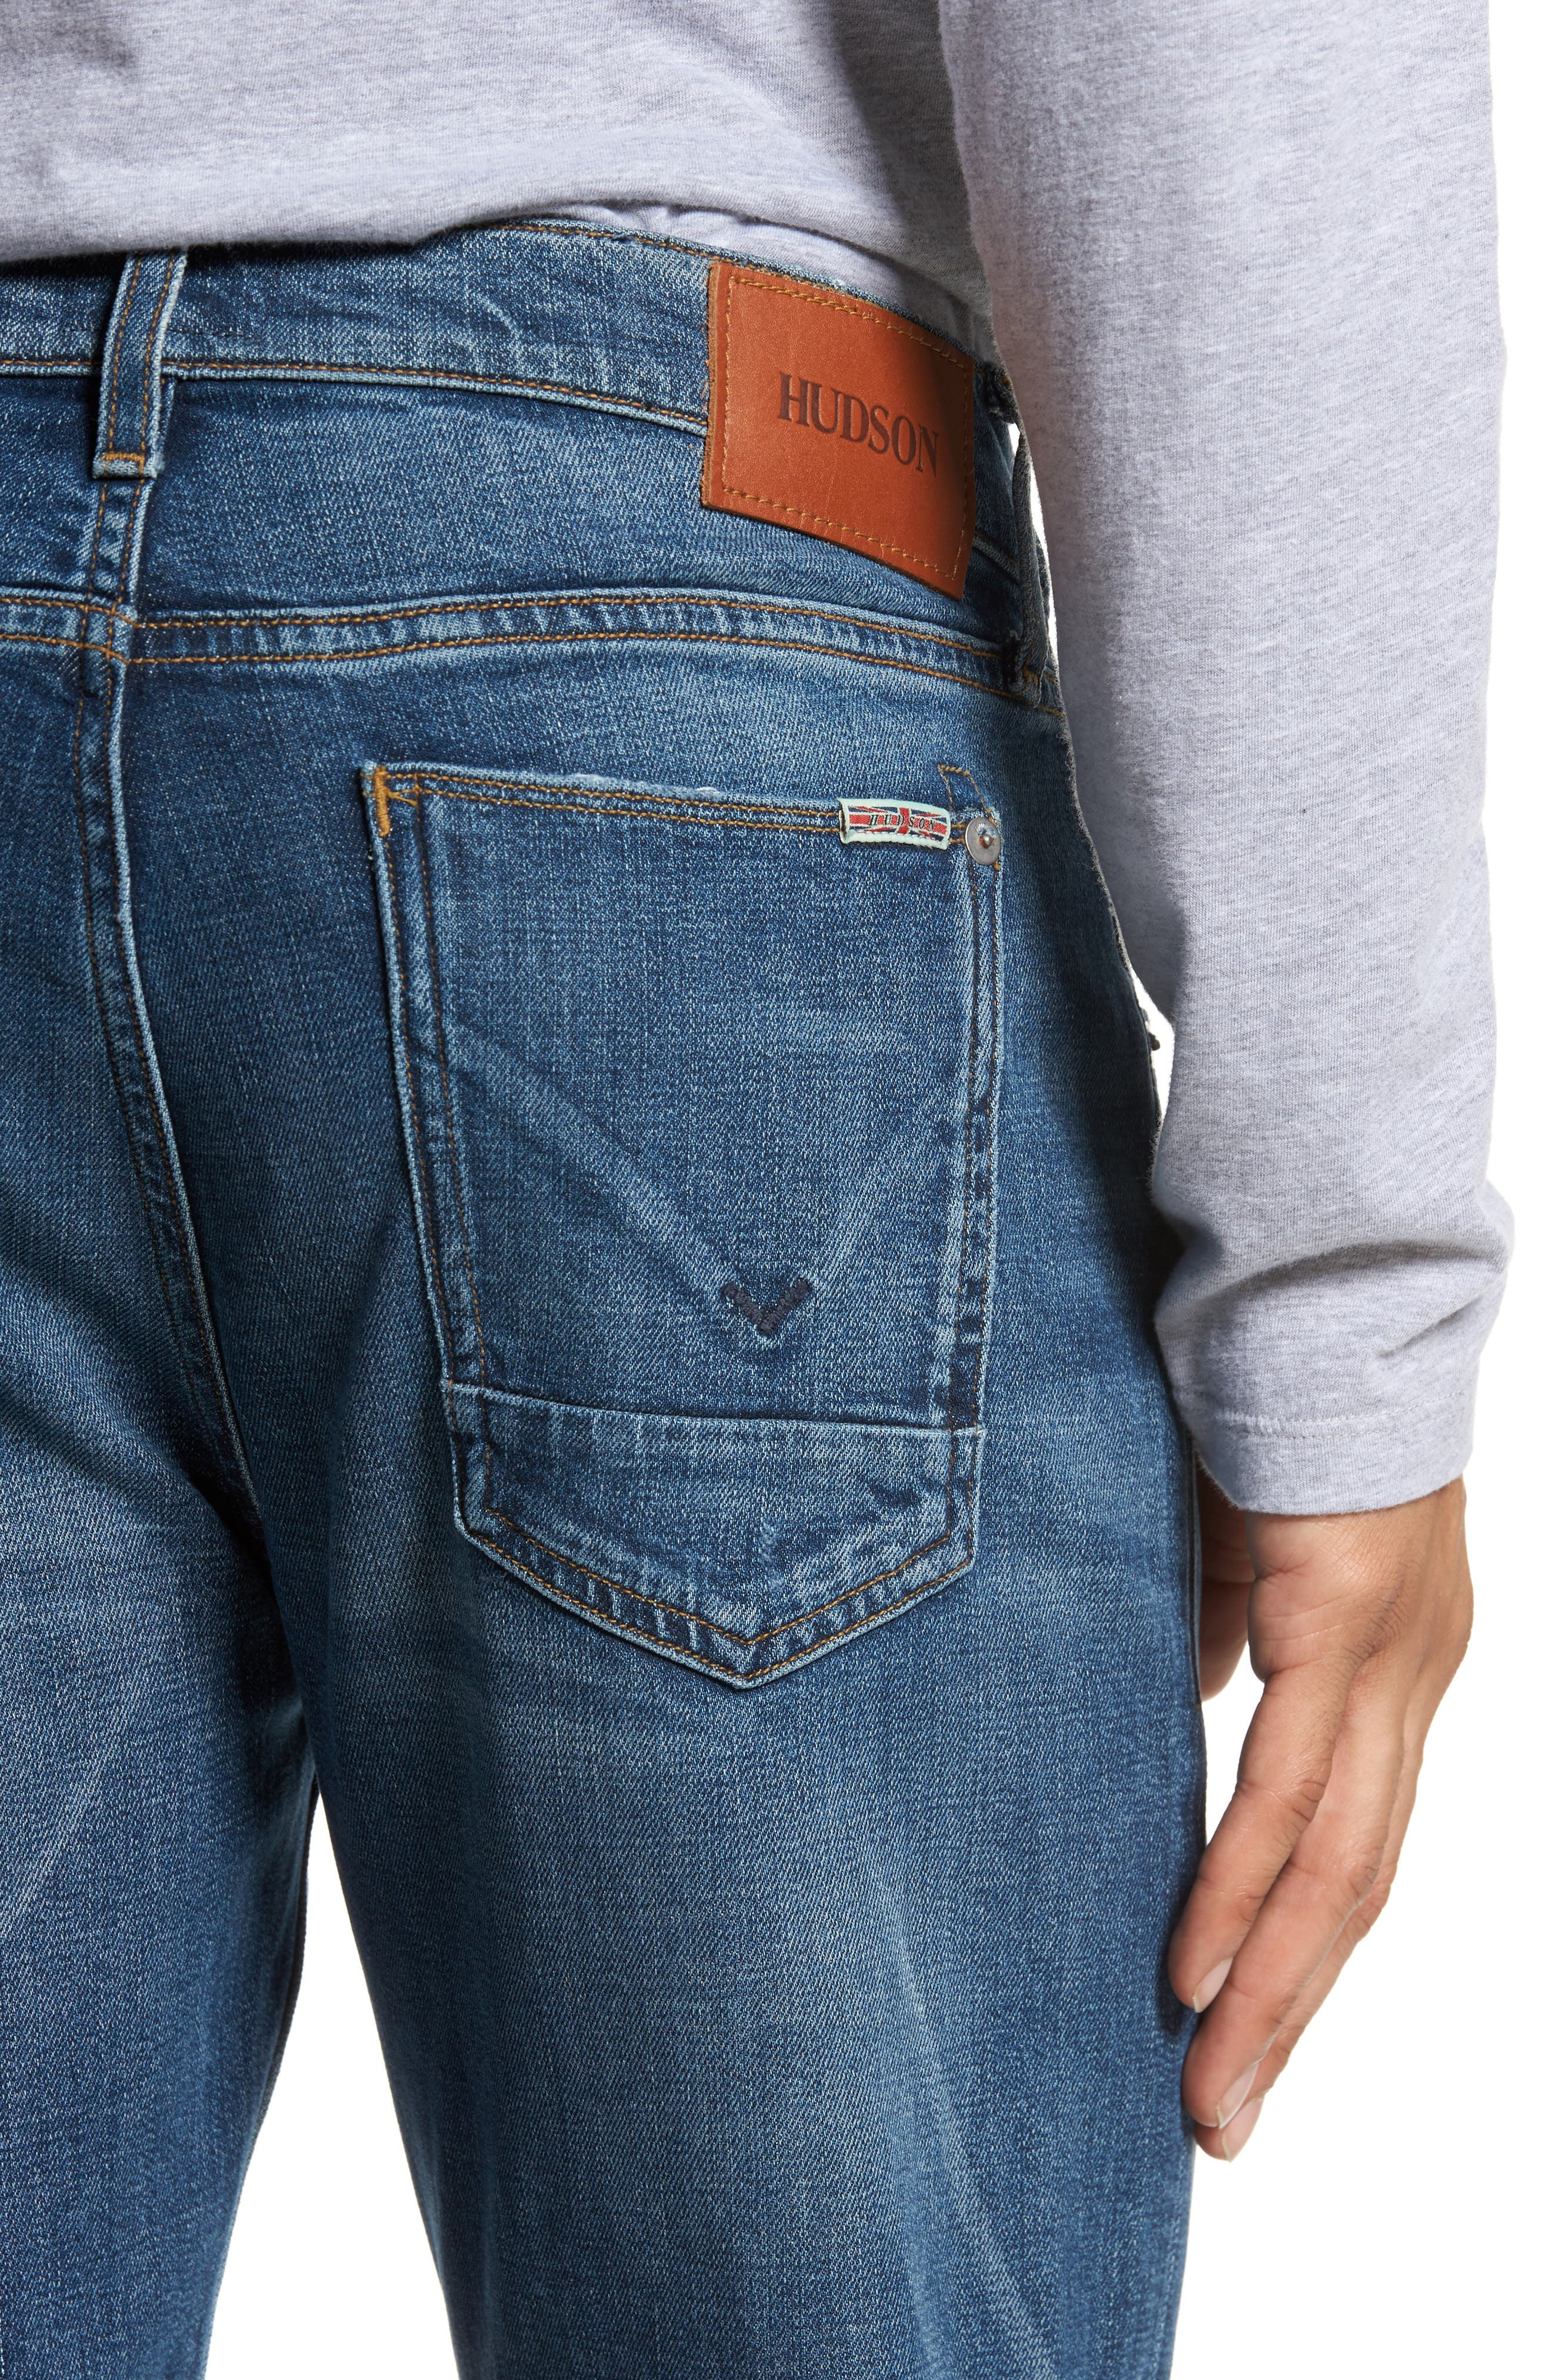 Byron Slim Straight Leg Jeans,                             Alternate thumbnail 4, color,                             400